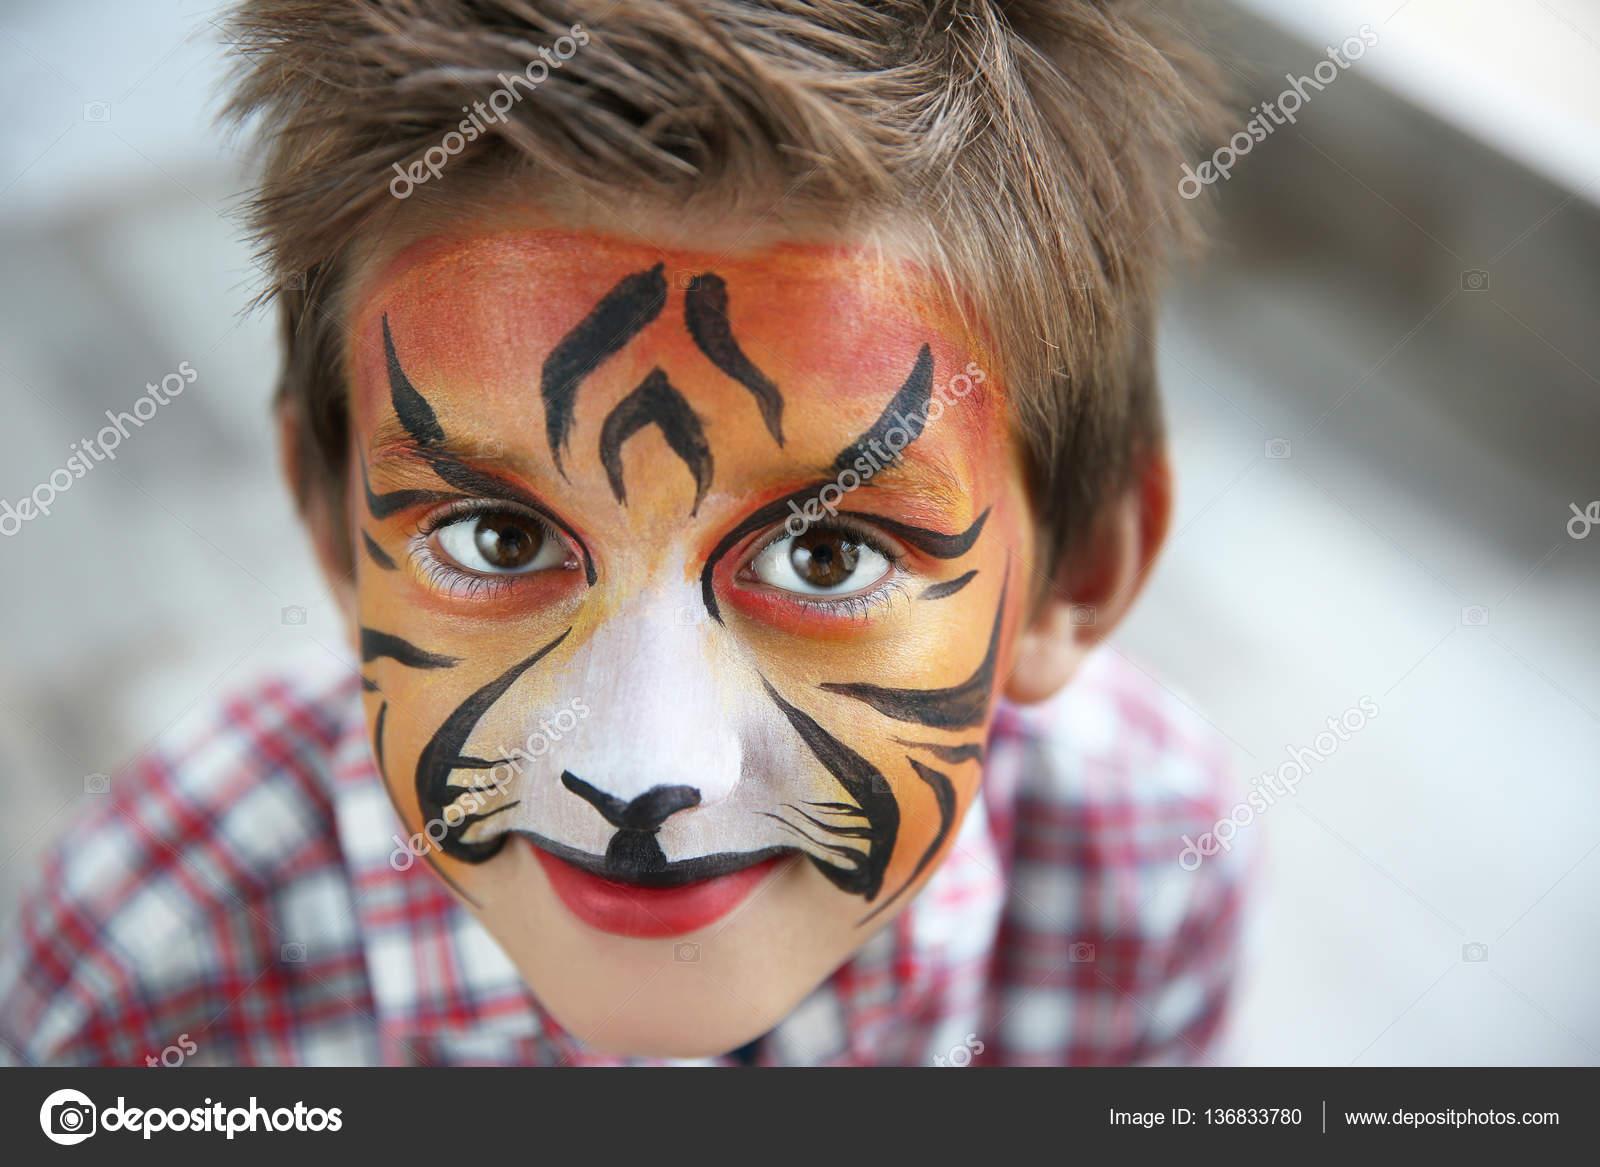 niedlichen kleinen jungen mit aqua make tiger fang stockfoto belchonock 136833780. Black Bedroom Furniture Sets. Home Design Ideas